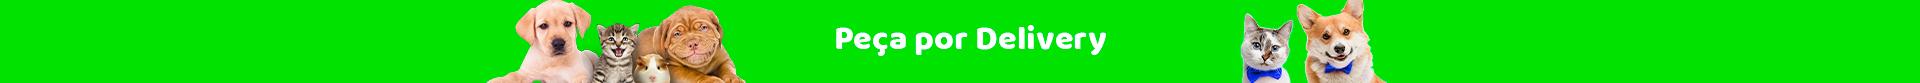 banner slim